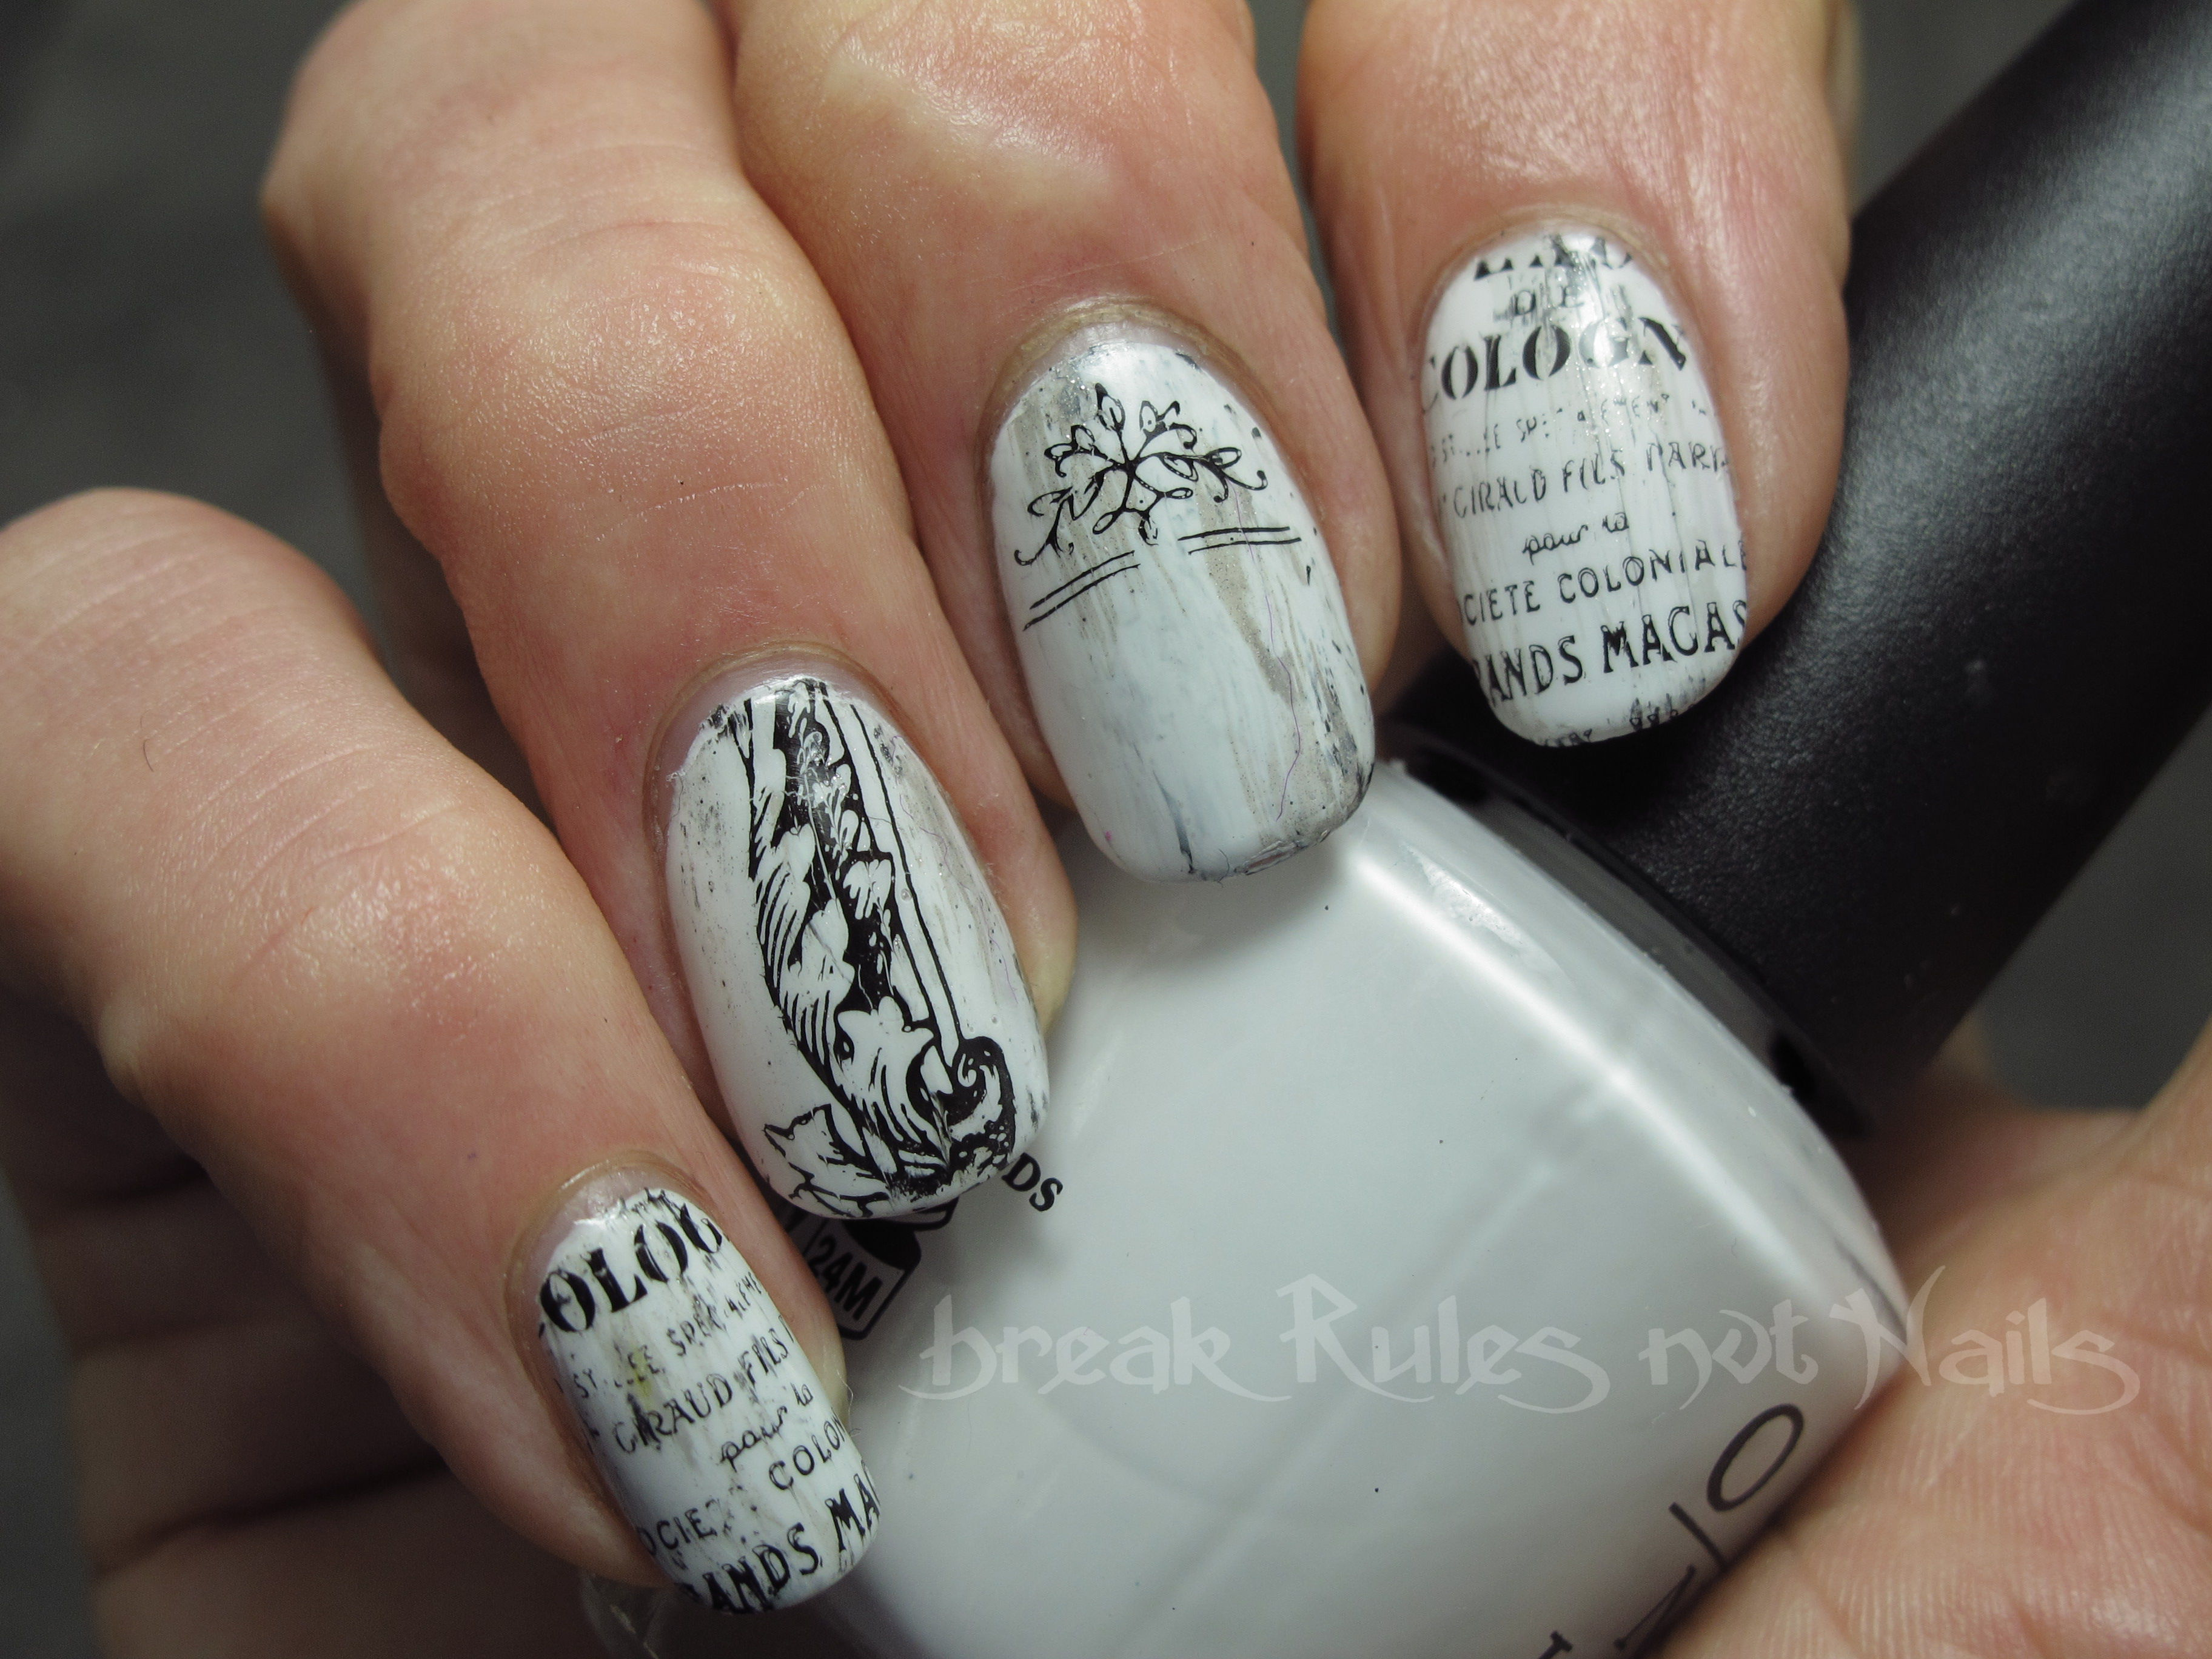 Vintage Nail Art Break Rules Not Nails